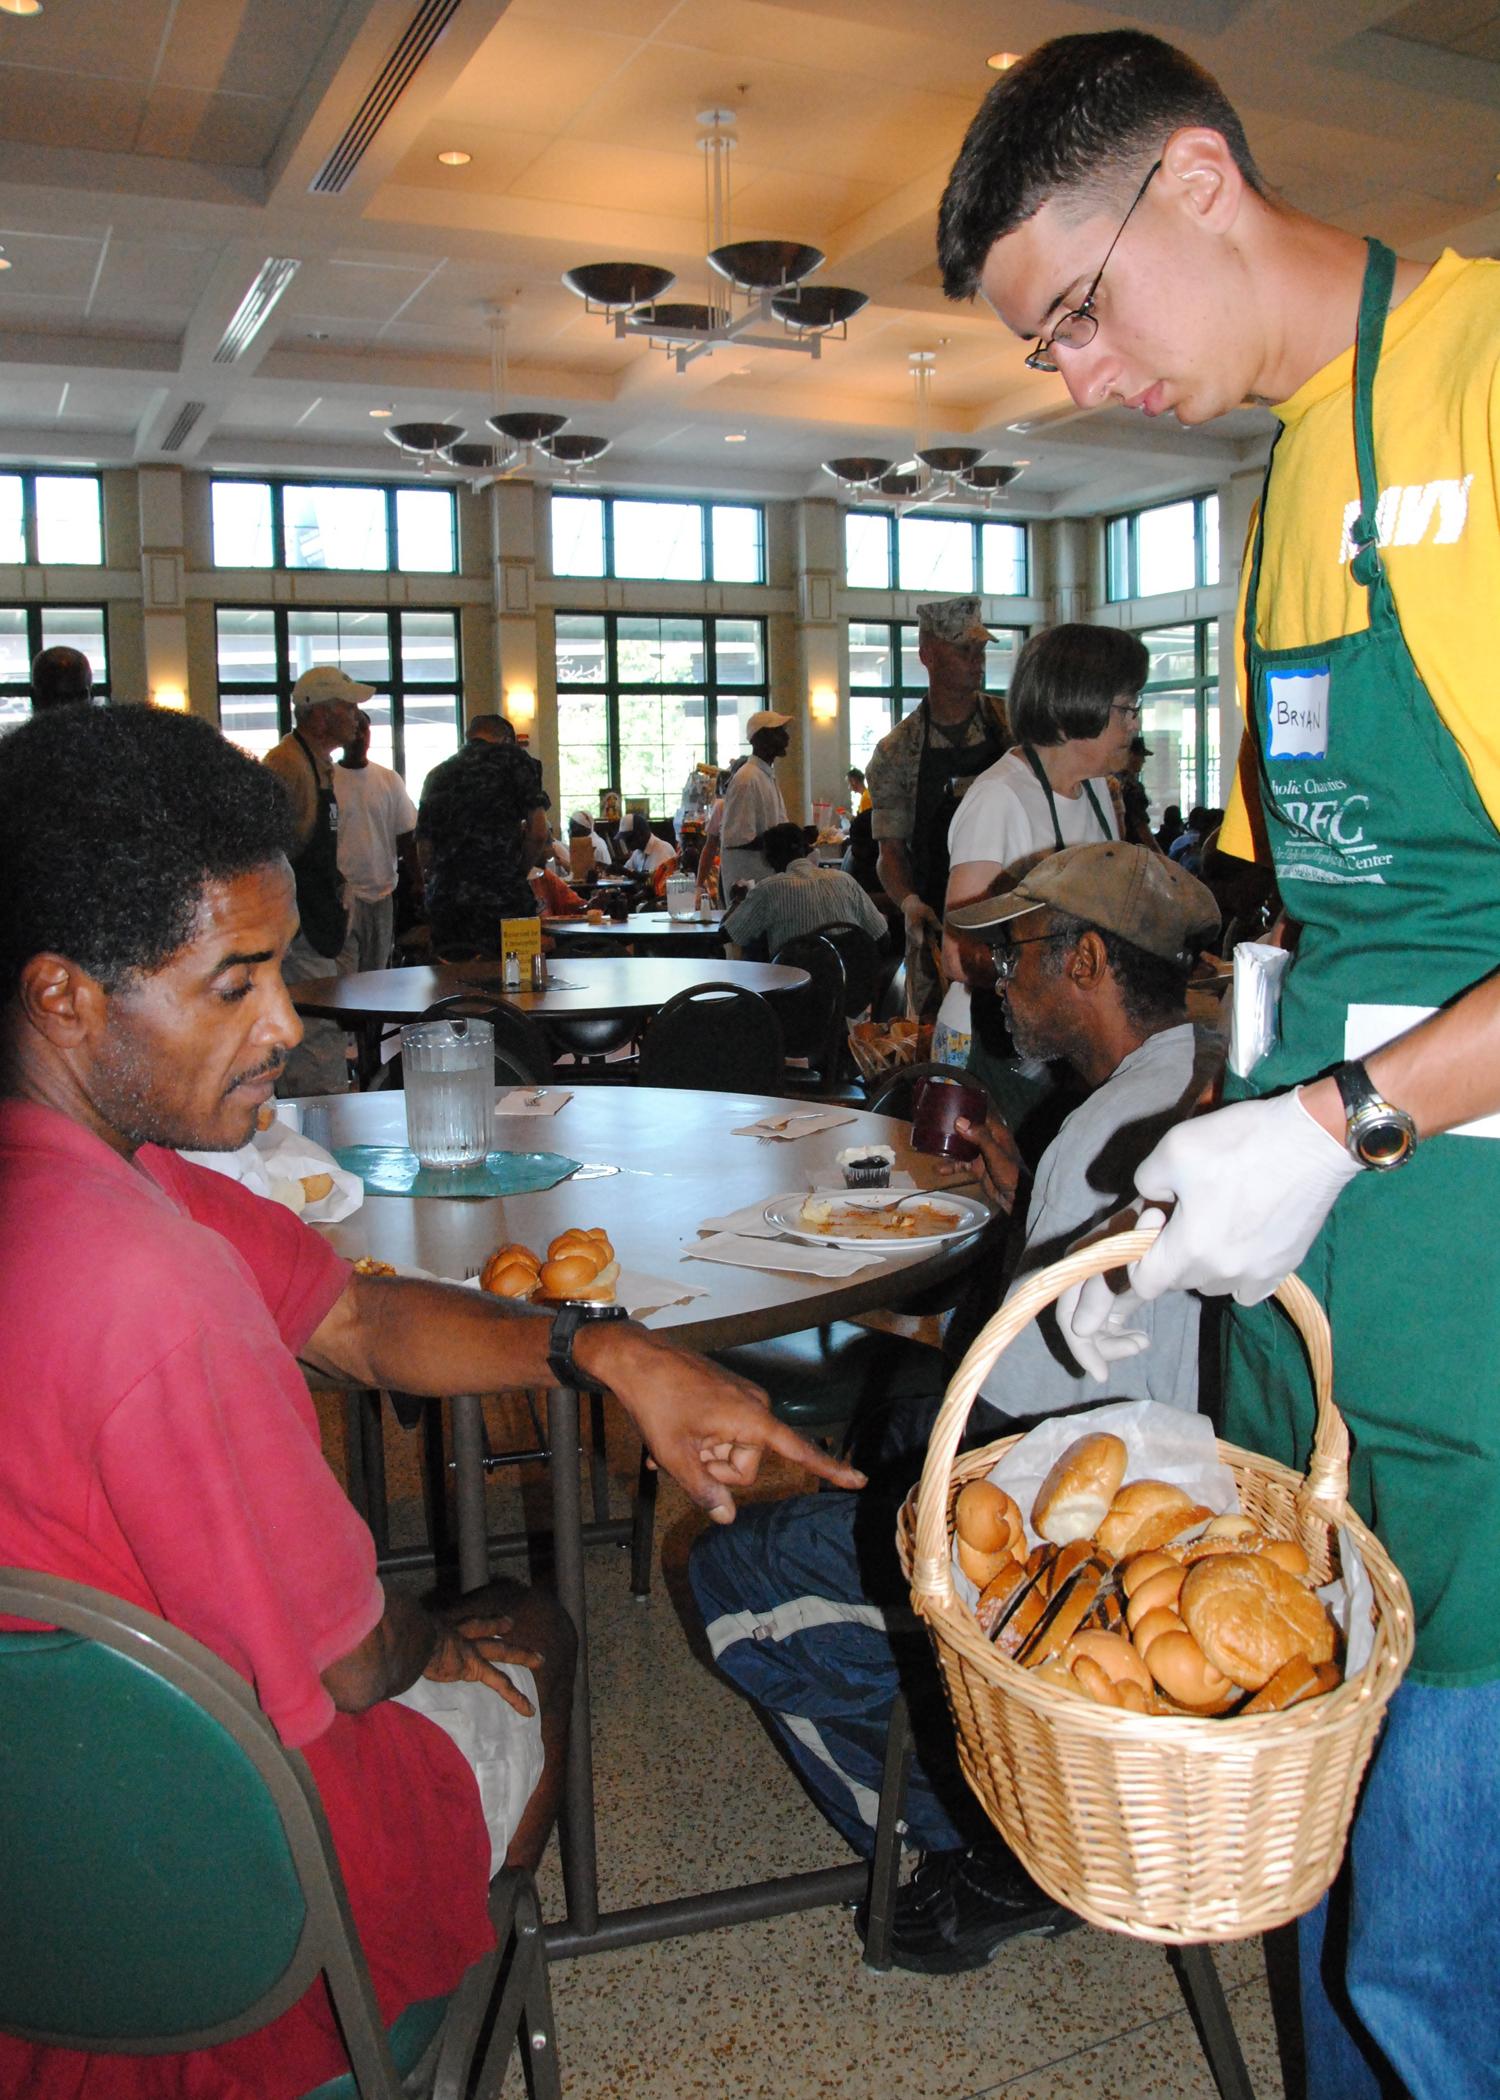 File:US Navy 100830-N-5647H-054 Airman Bryan Pickett serves bread to ...